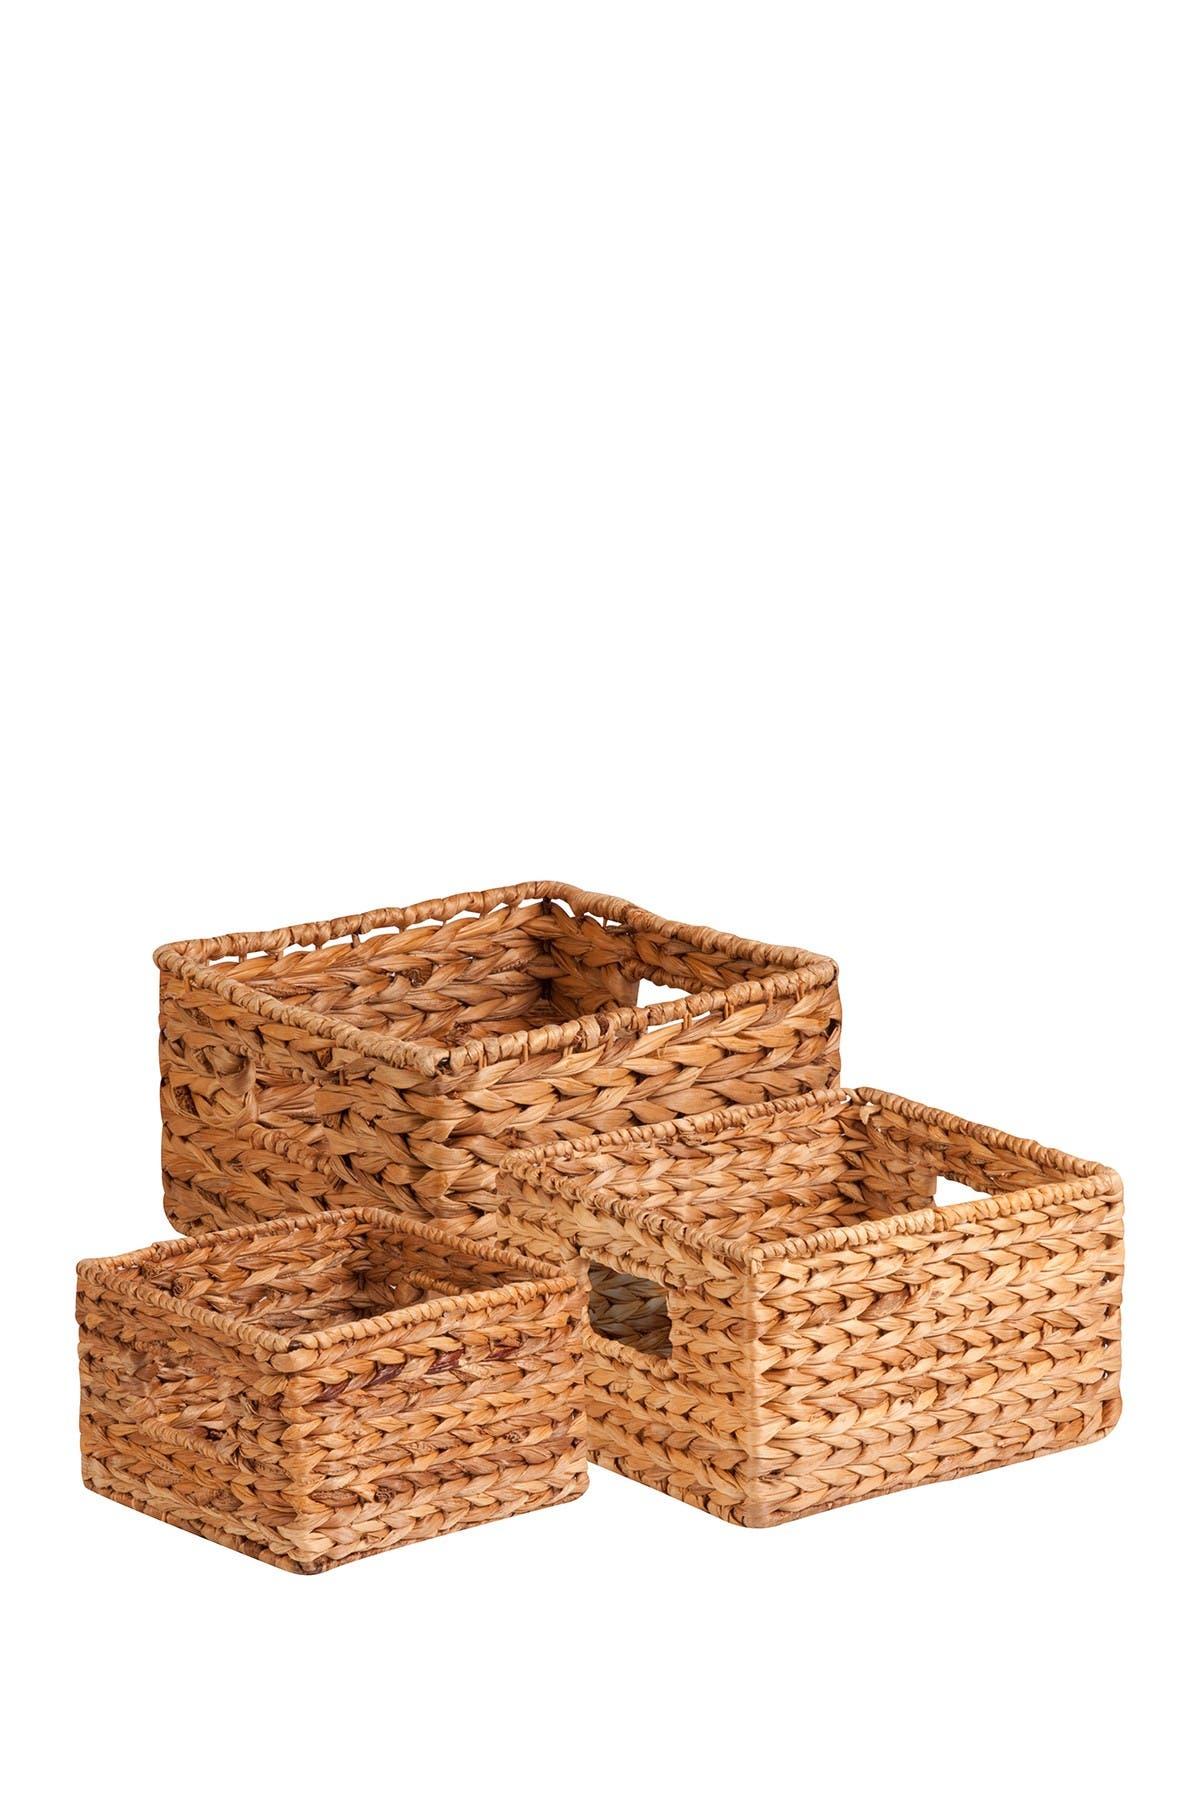 Image of Honey-Can-Do Water Natural Hyacinth Basket Set